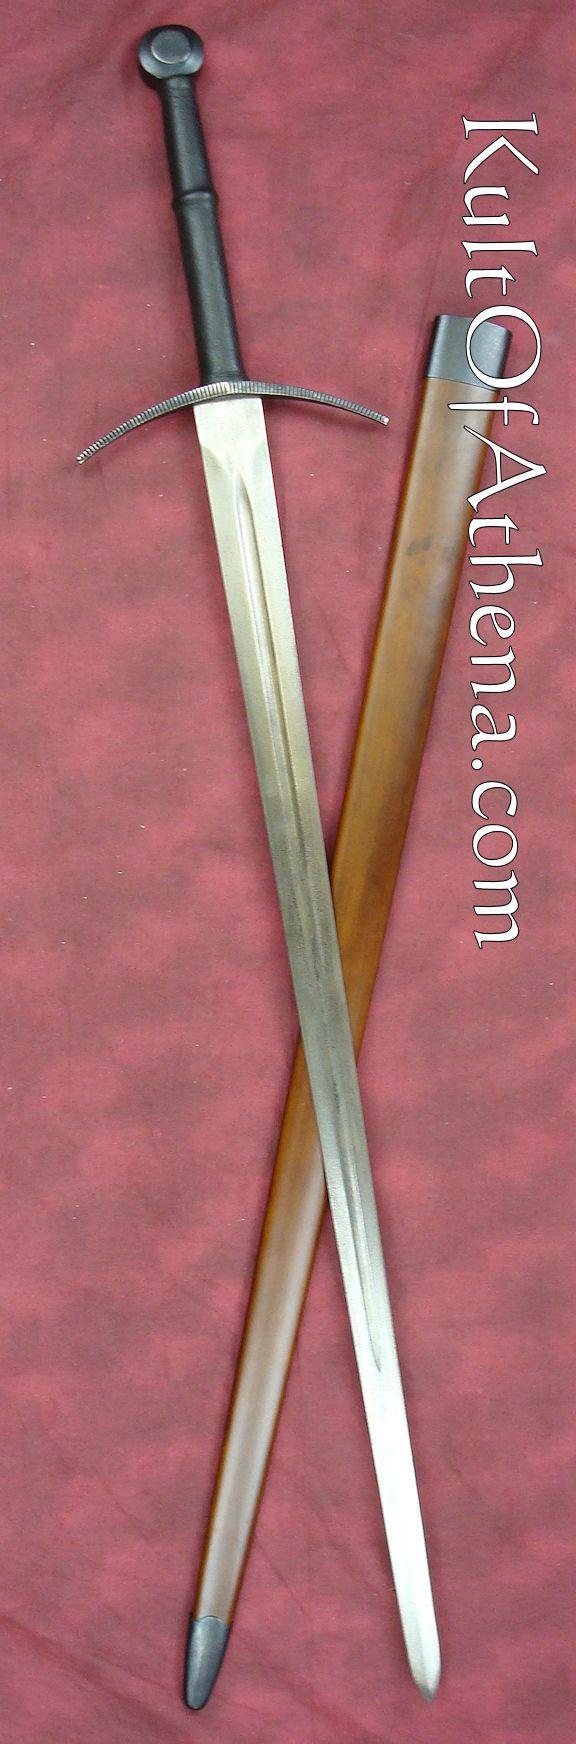 Hanwei Bastard Sword - Antiqued